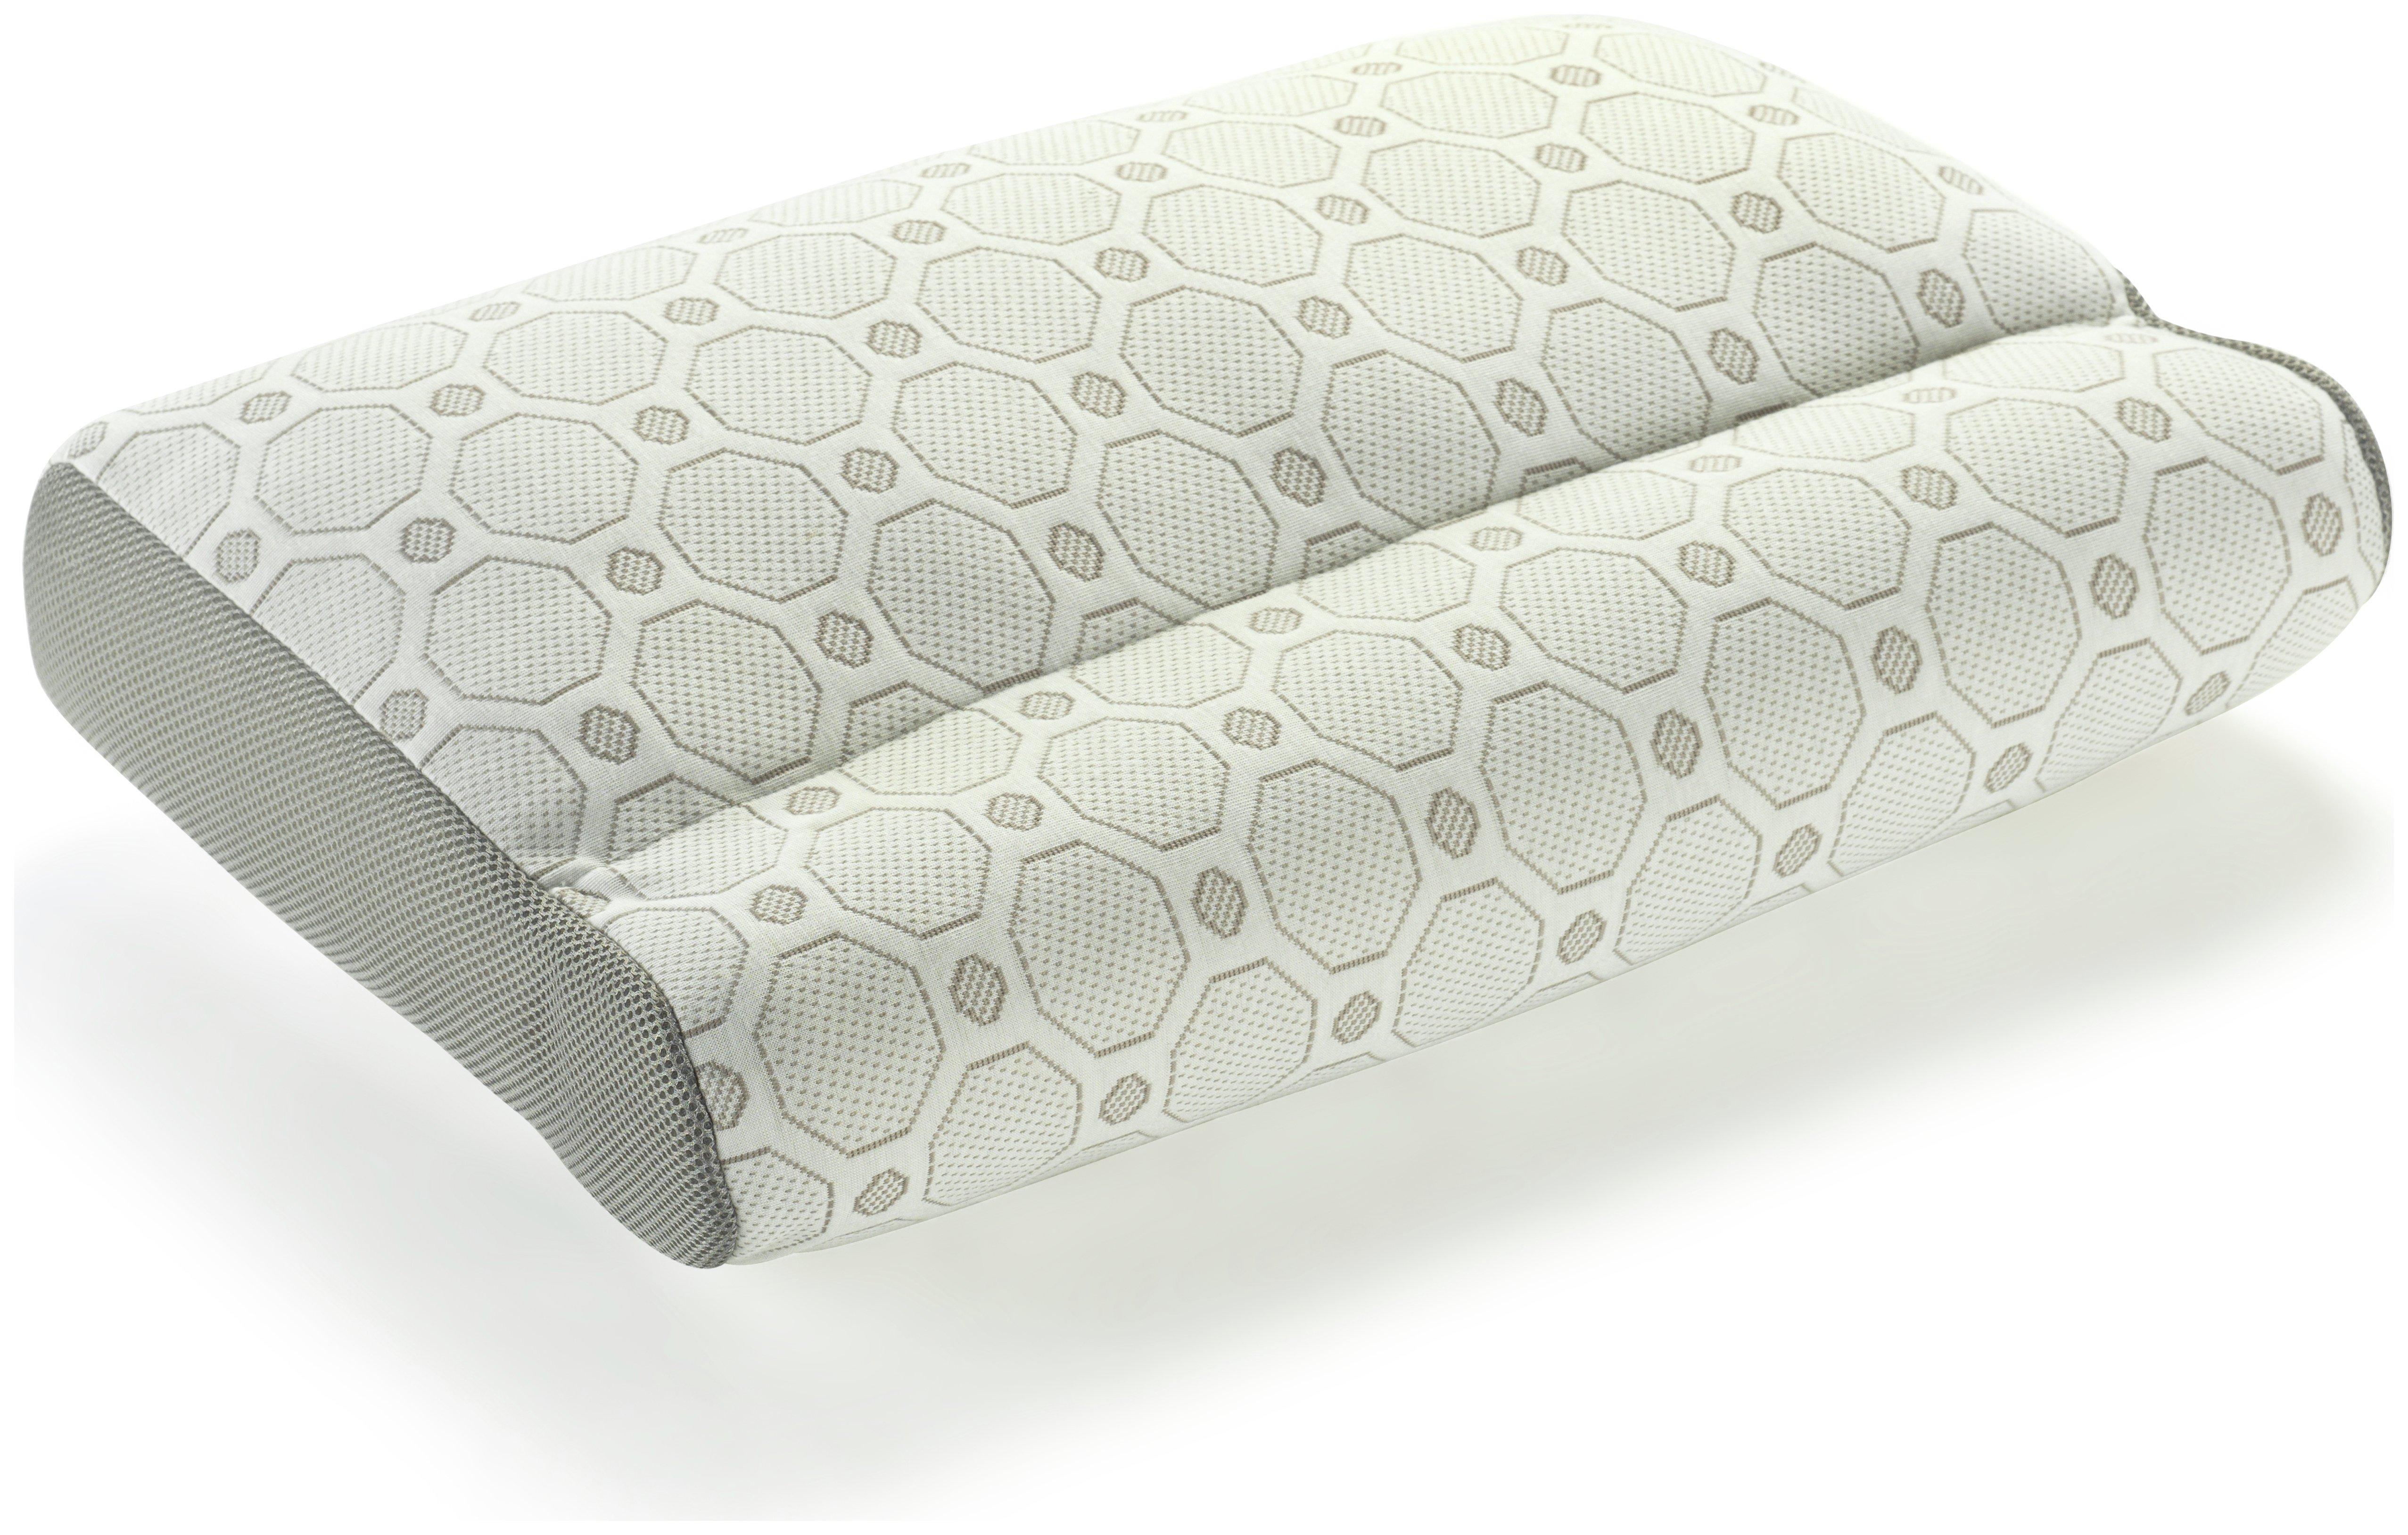 Image of Dormeo Memory Octasense Deluxe Pillow.